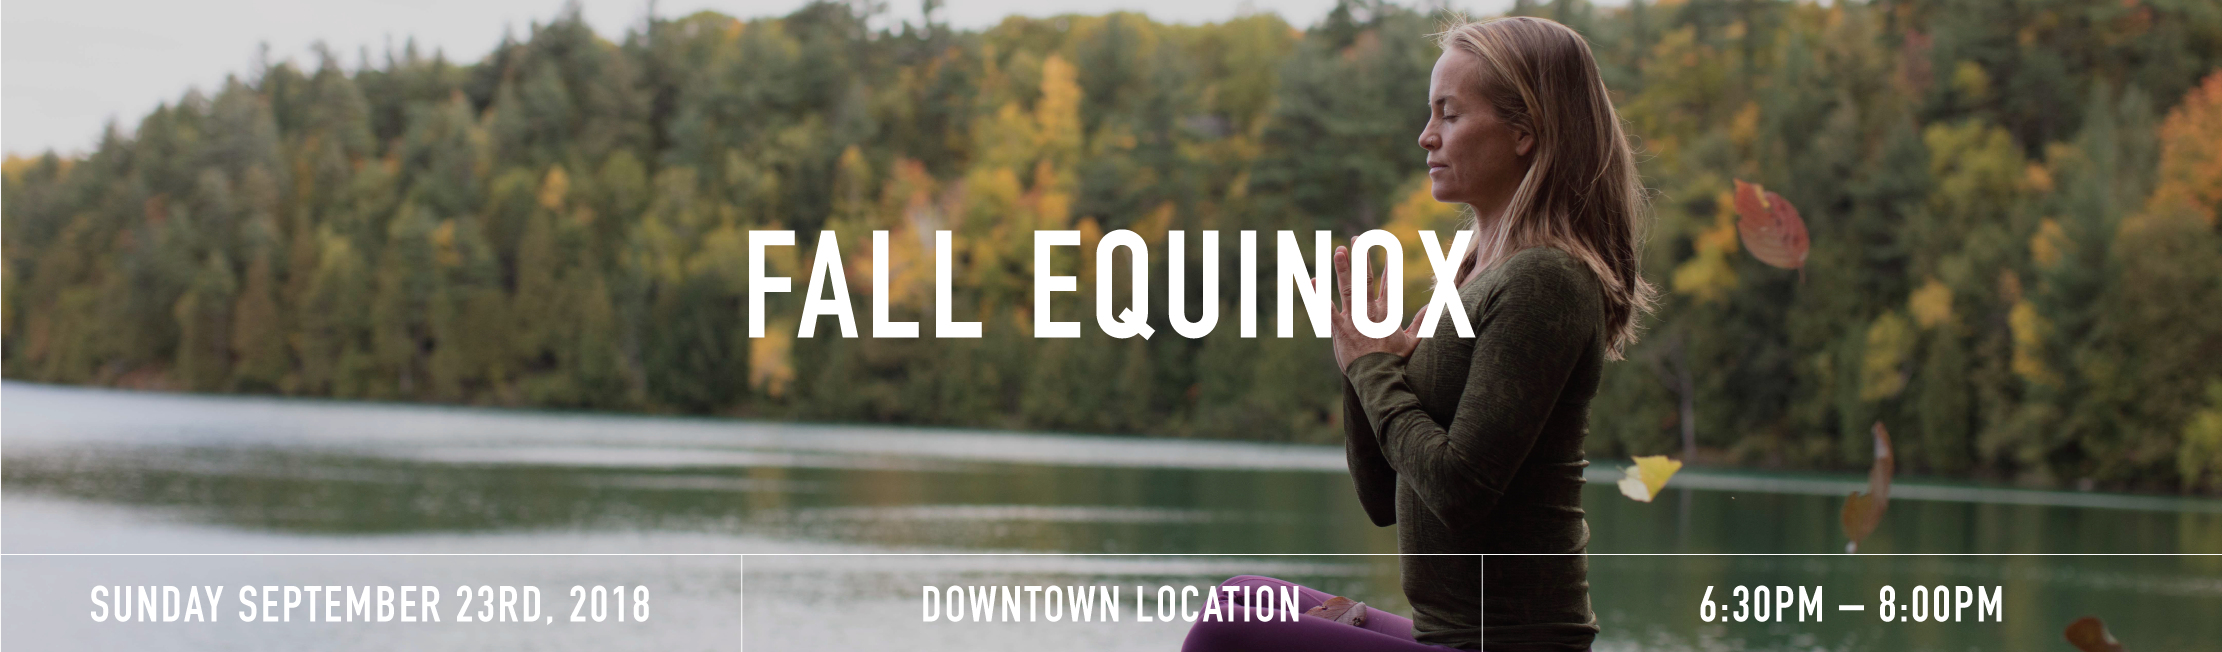 Fall equinox banner  1